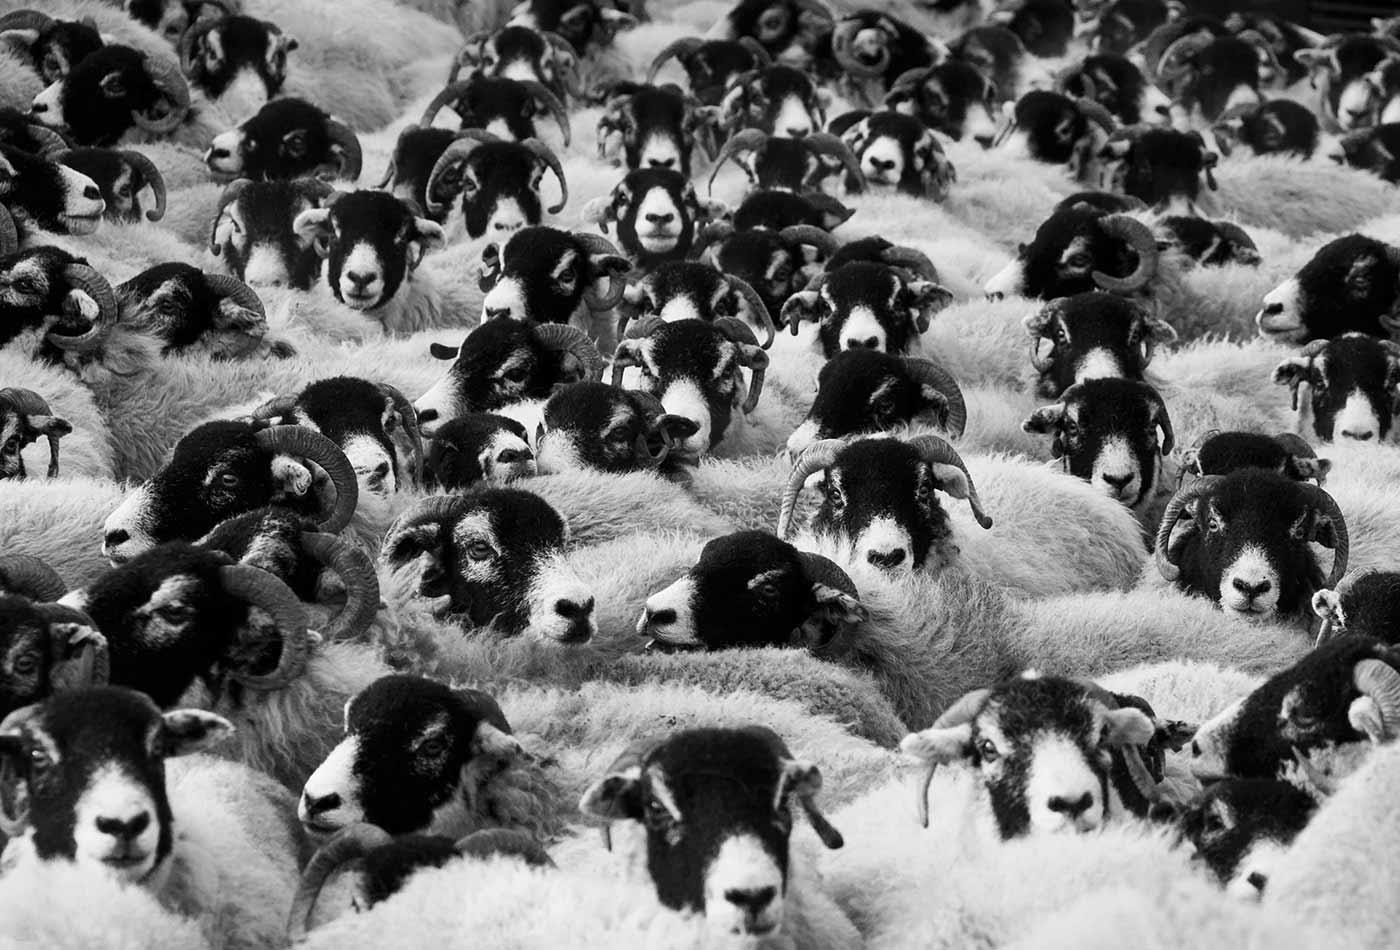 Herding the crowd.